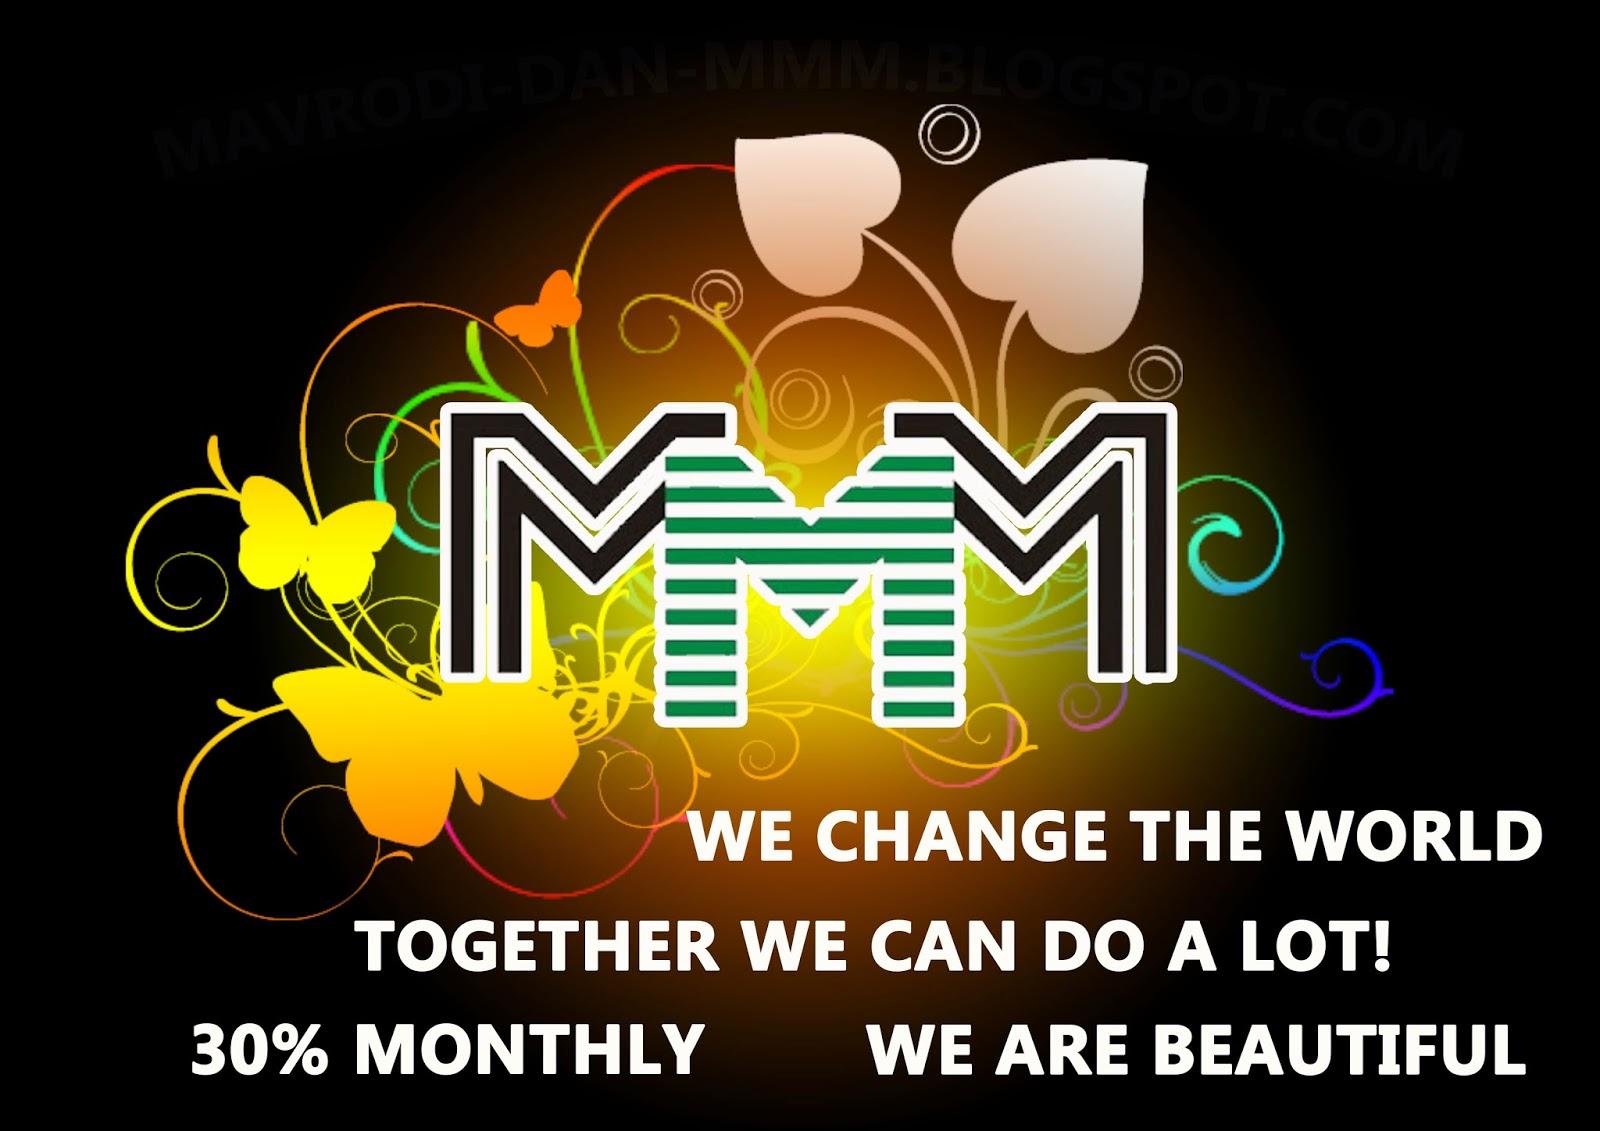 http://mavrodi-dan-mmm.blogspot.com/2014/01/daftar-mmm-secara-ofline-atau-manual.html